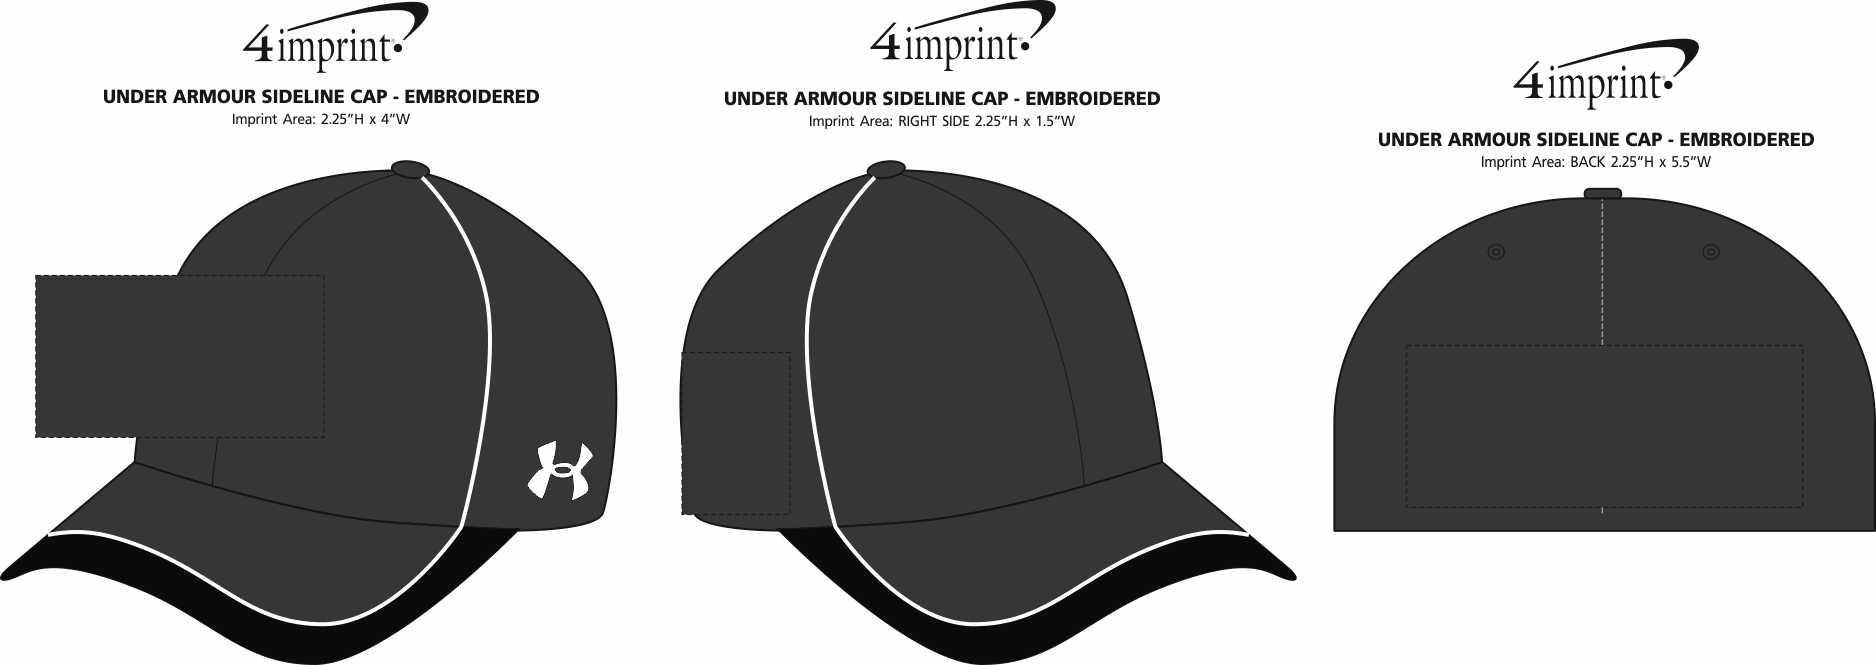 02fb91ab5 4imprint.com: Under Armour Sideline Cap - Embroidered 134886-E